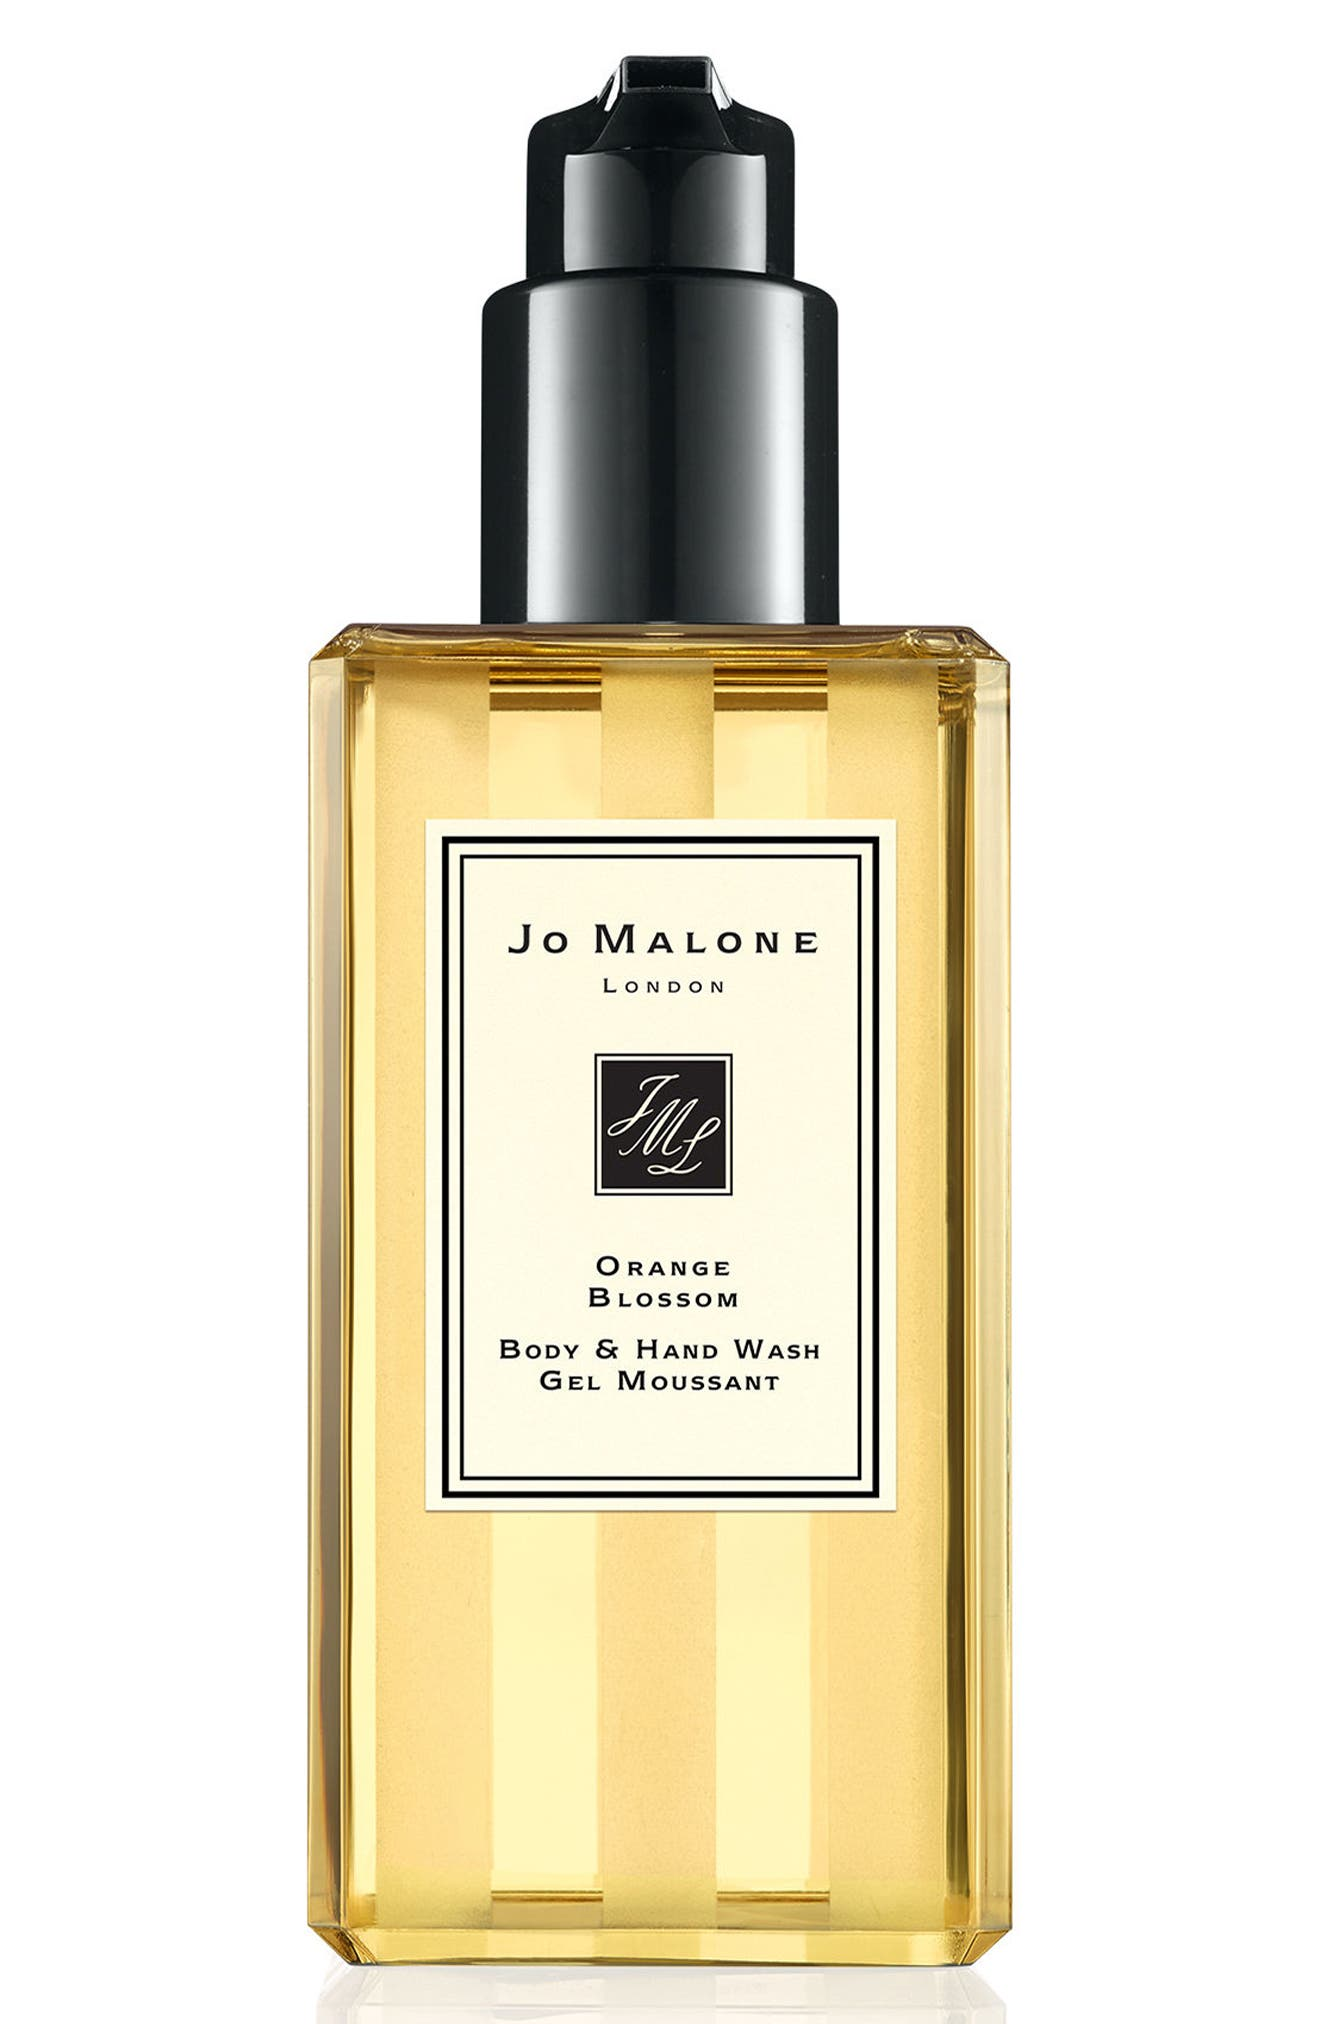 Jo Malone London™ Orange Blossom Body & Hand Wash